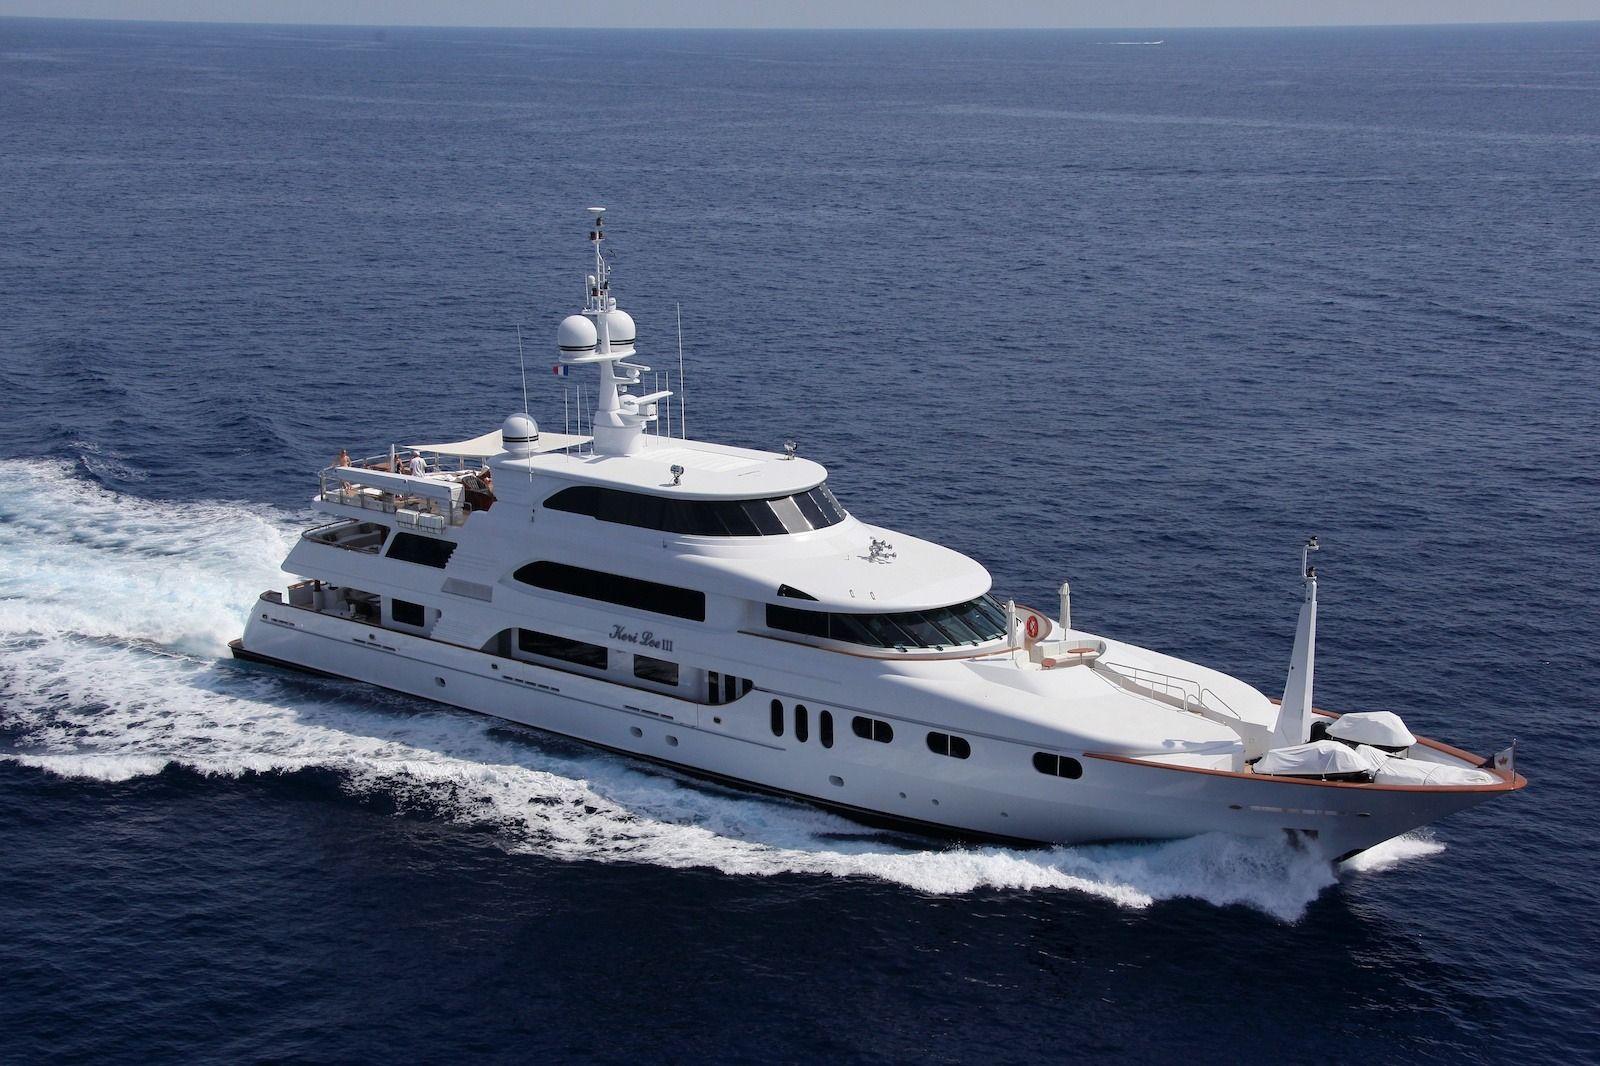 KERI LEE III - Trinity 54m - 6 Cabins - Naples - Porto Cervo - Monaco - Leeward Islands - Bahamas